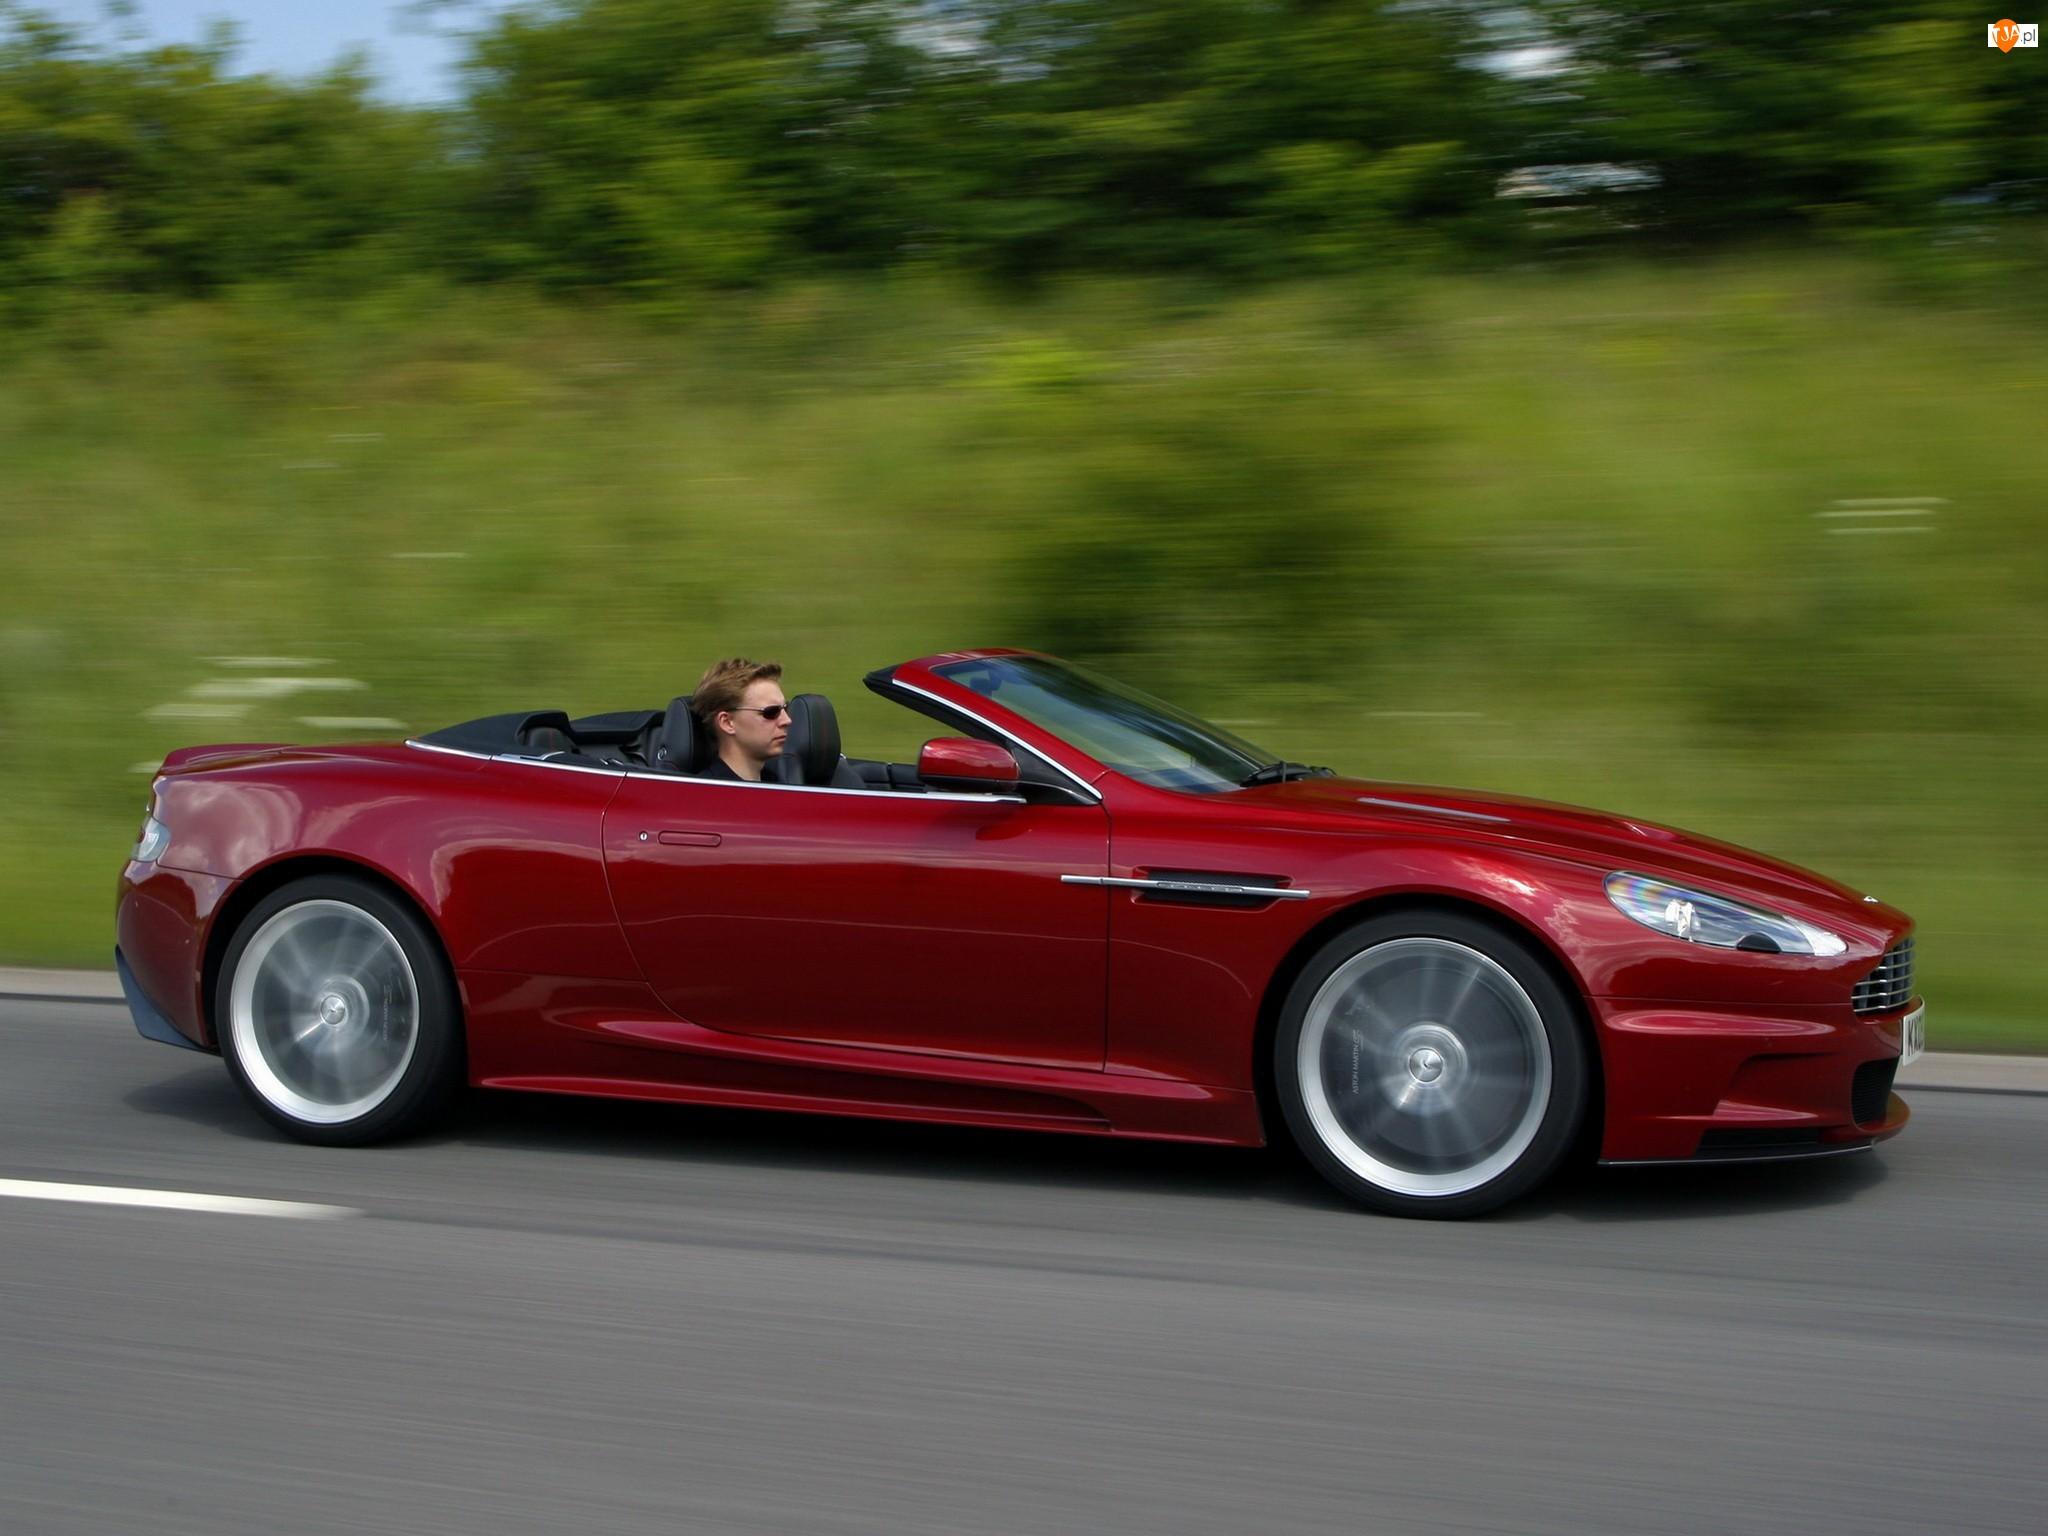 Aston Martin DBS, V12